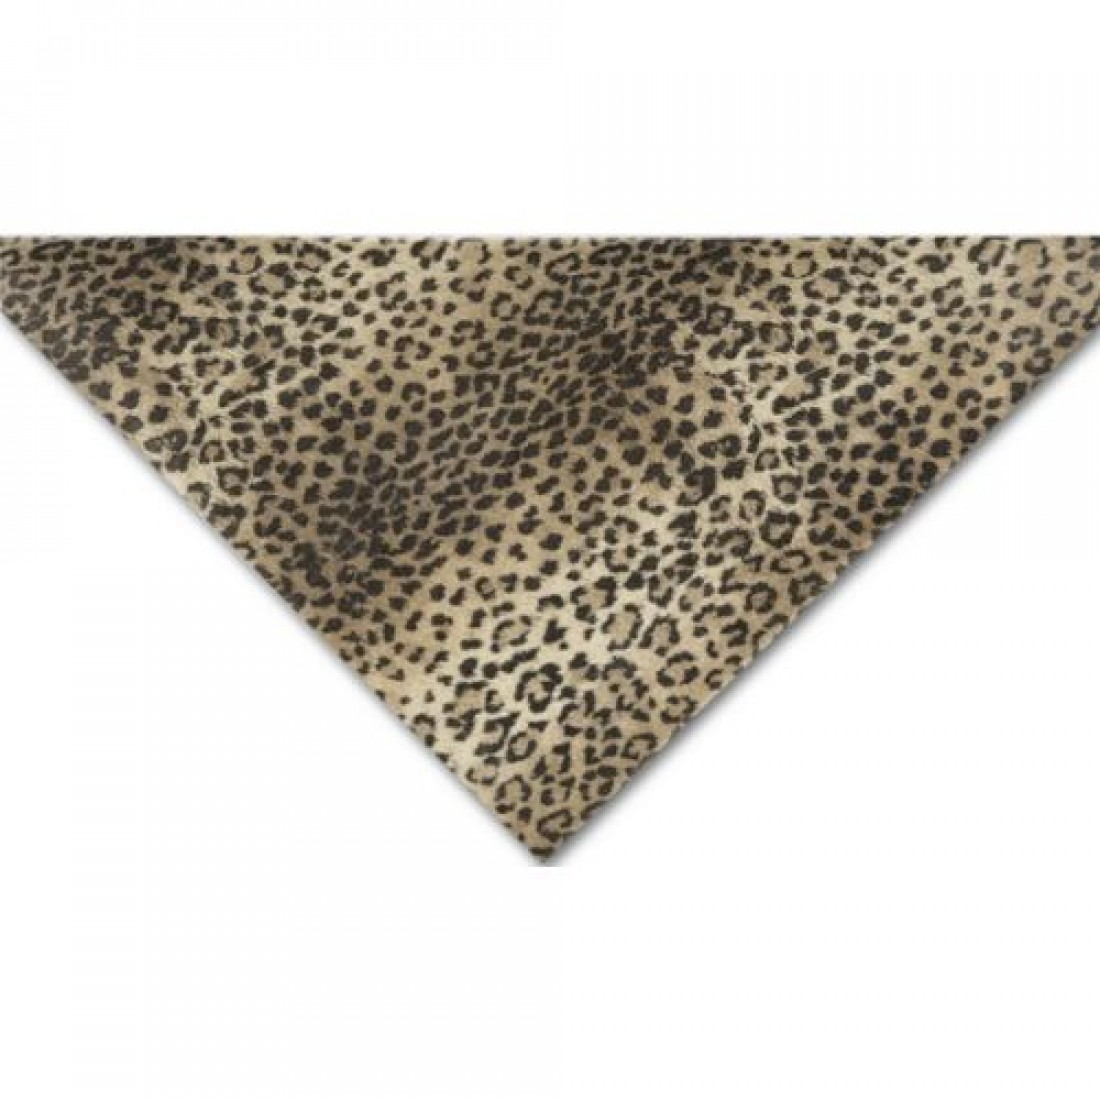 "Leopard Tissue Paper 20x30"""